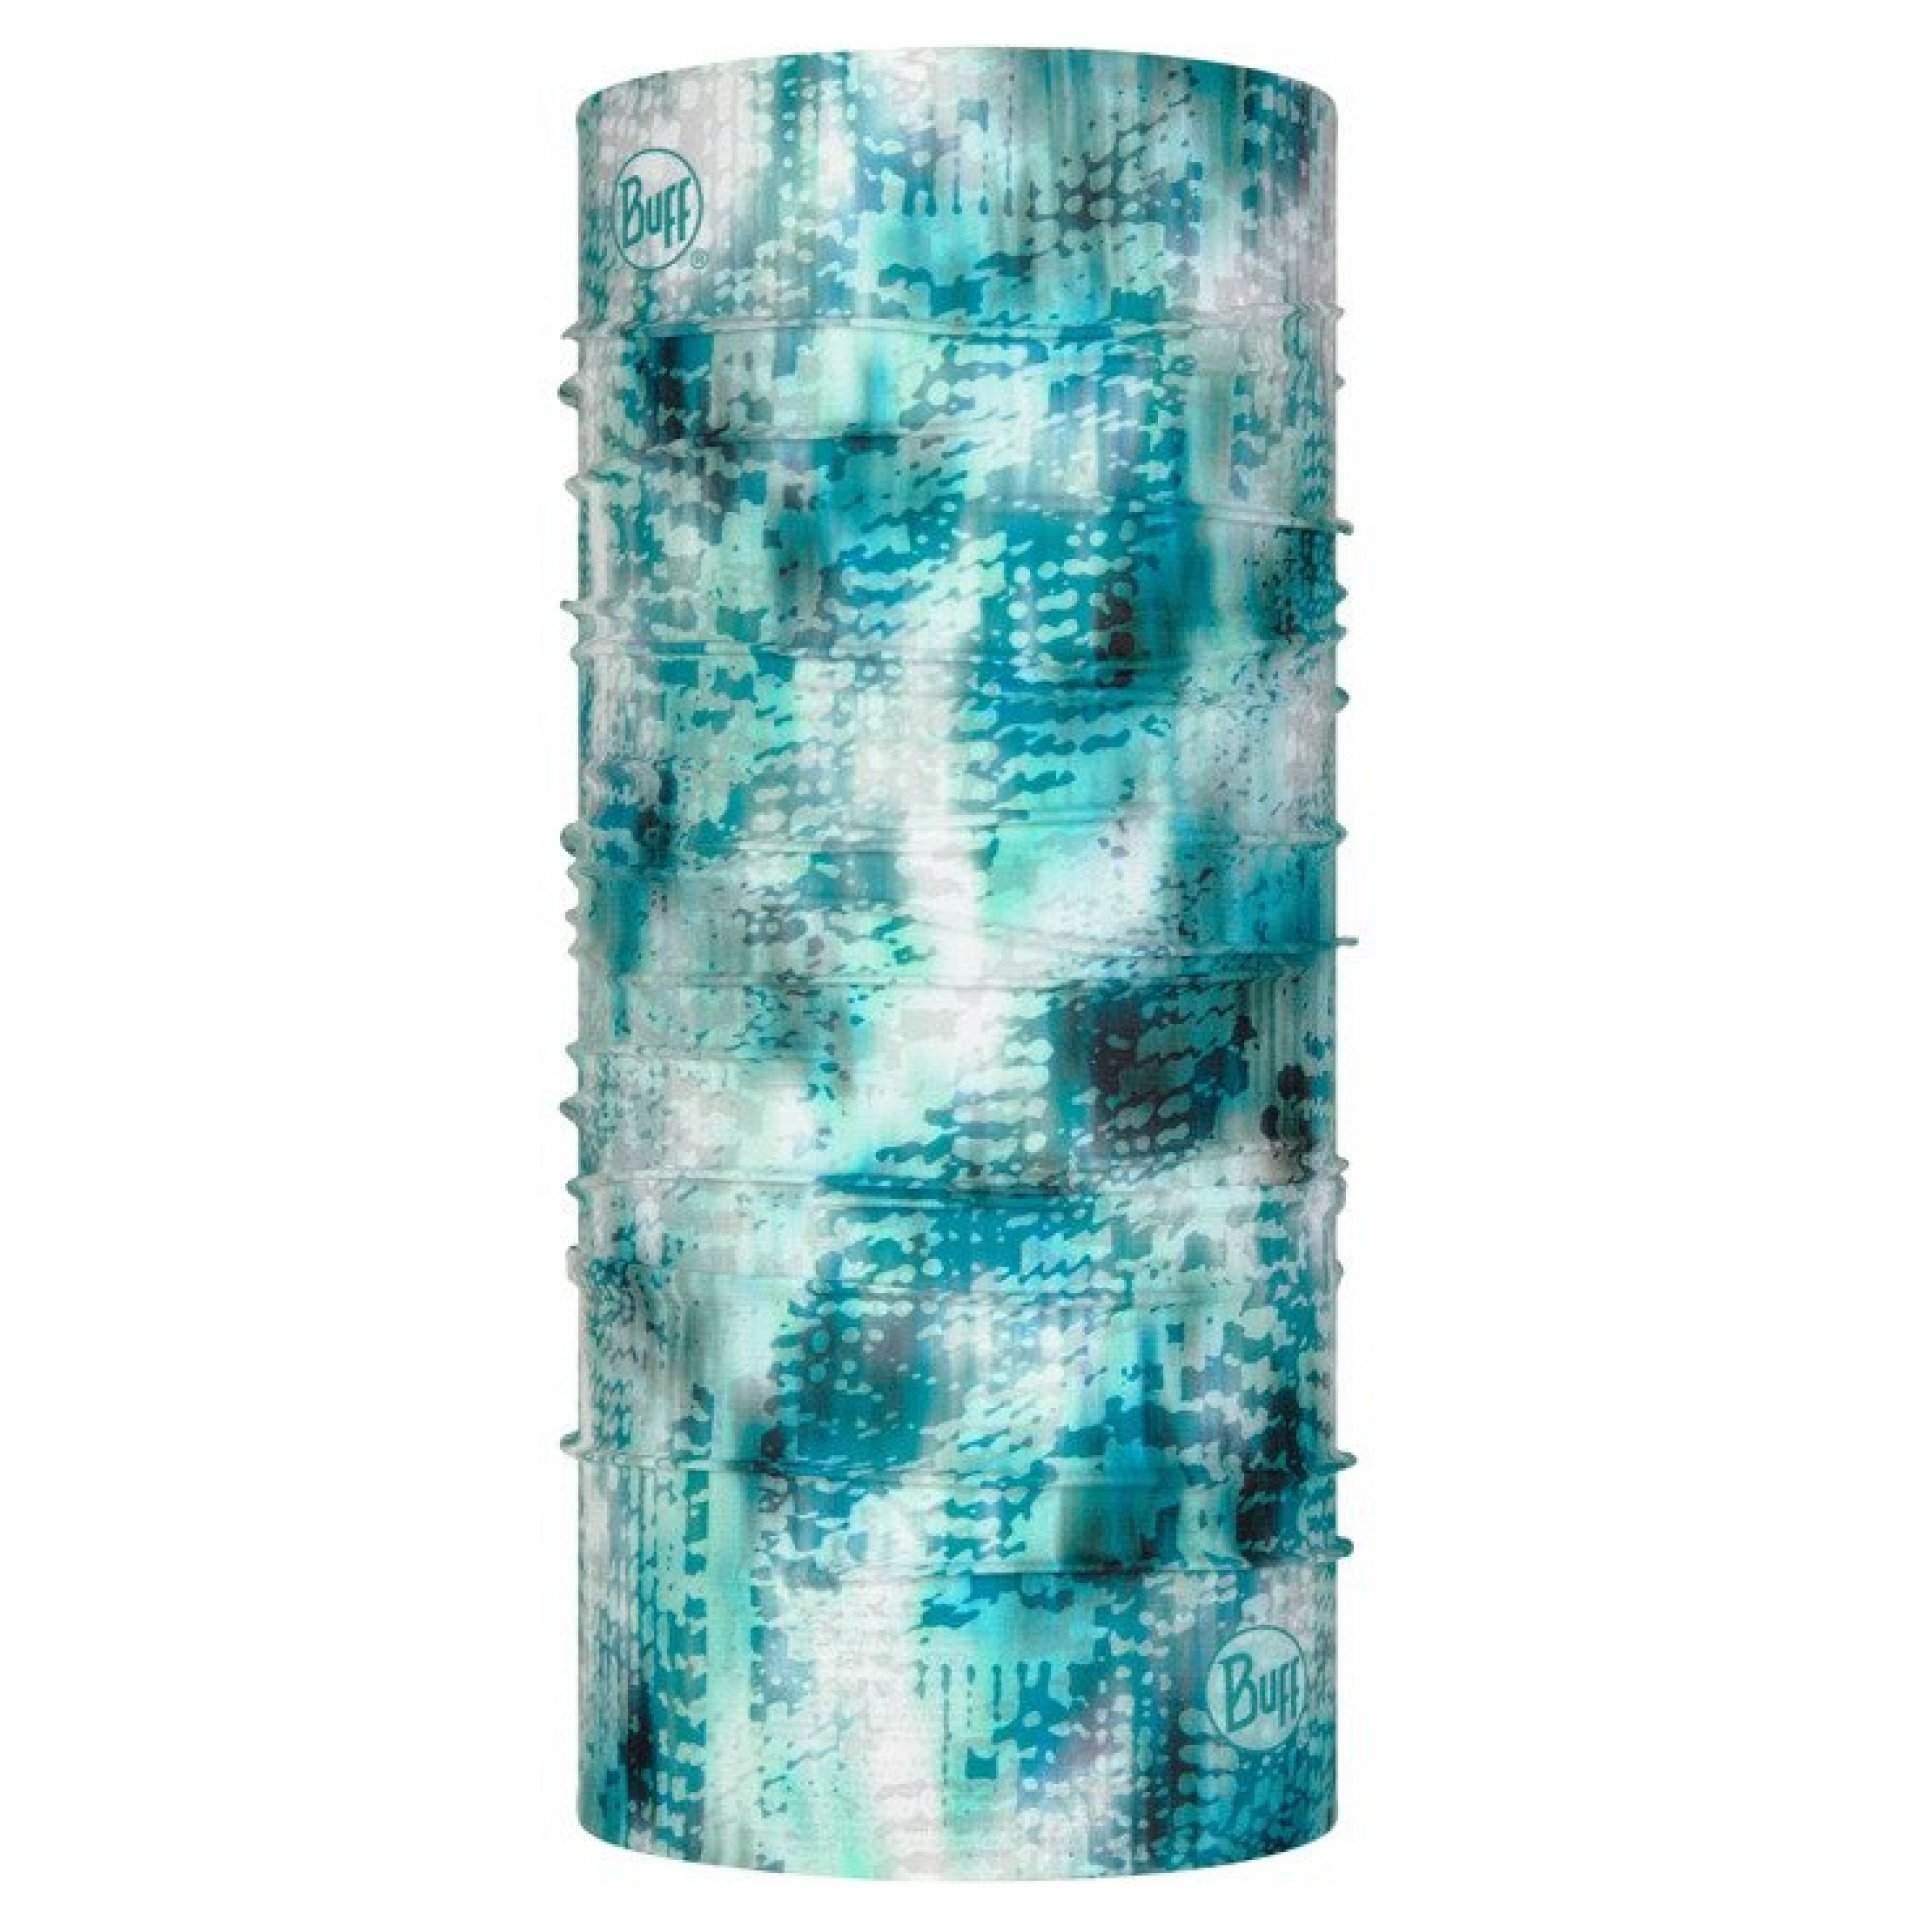 CHUSTA BUFF COOLNET UV+ BLAUW TURQUOISE